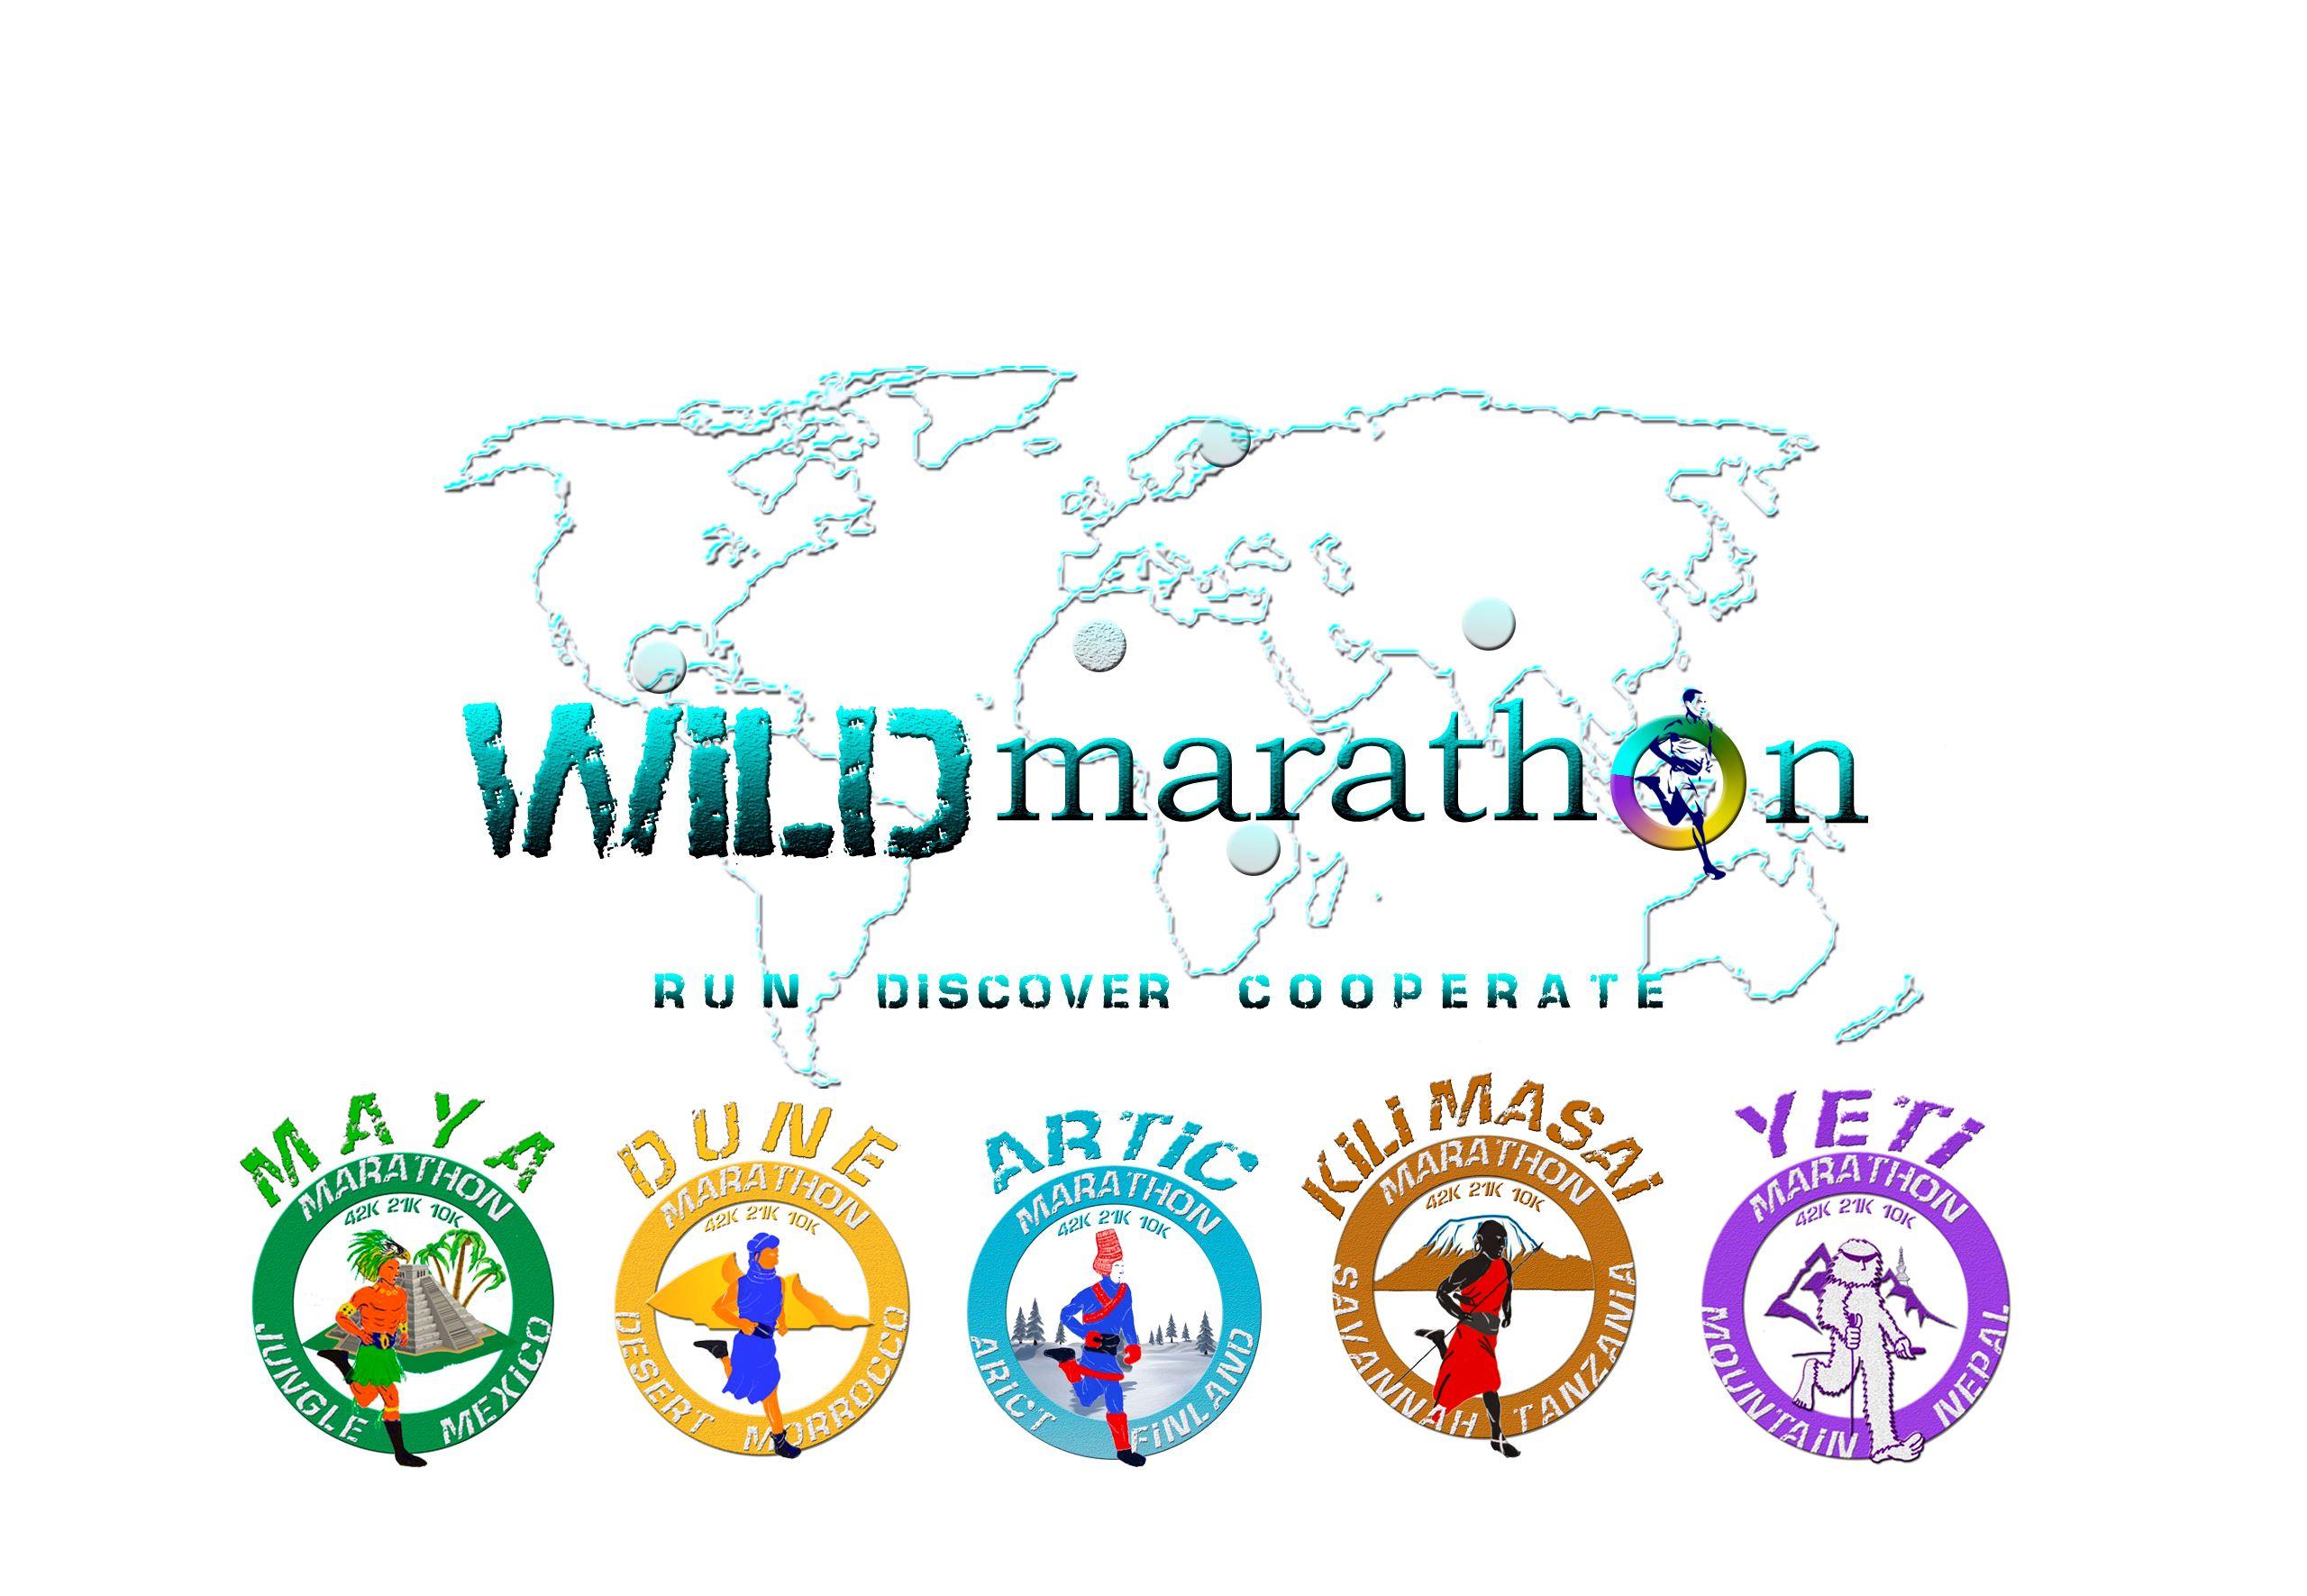 Wildmarathon Series - Run in the best locations